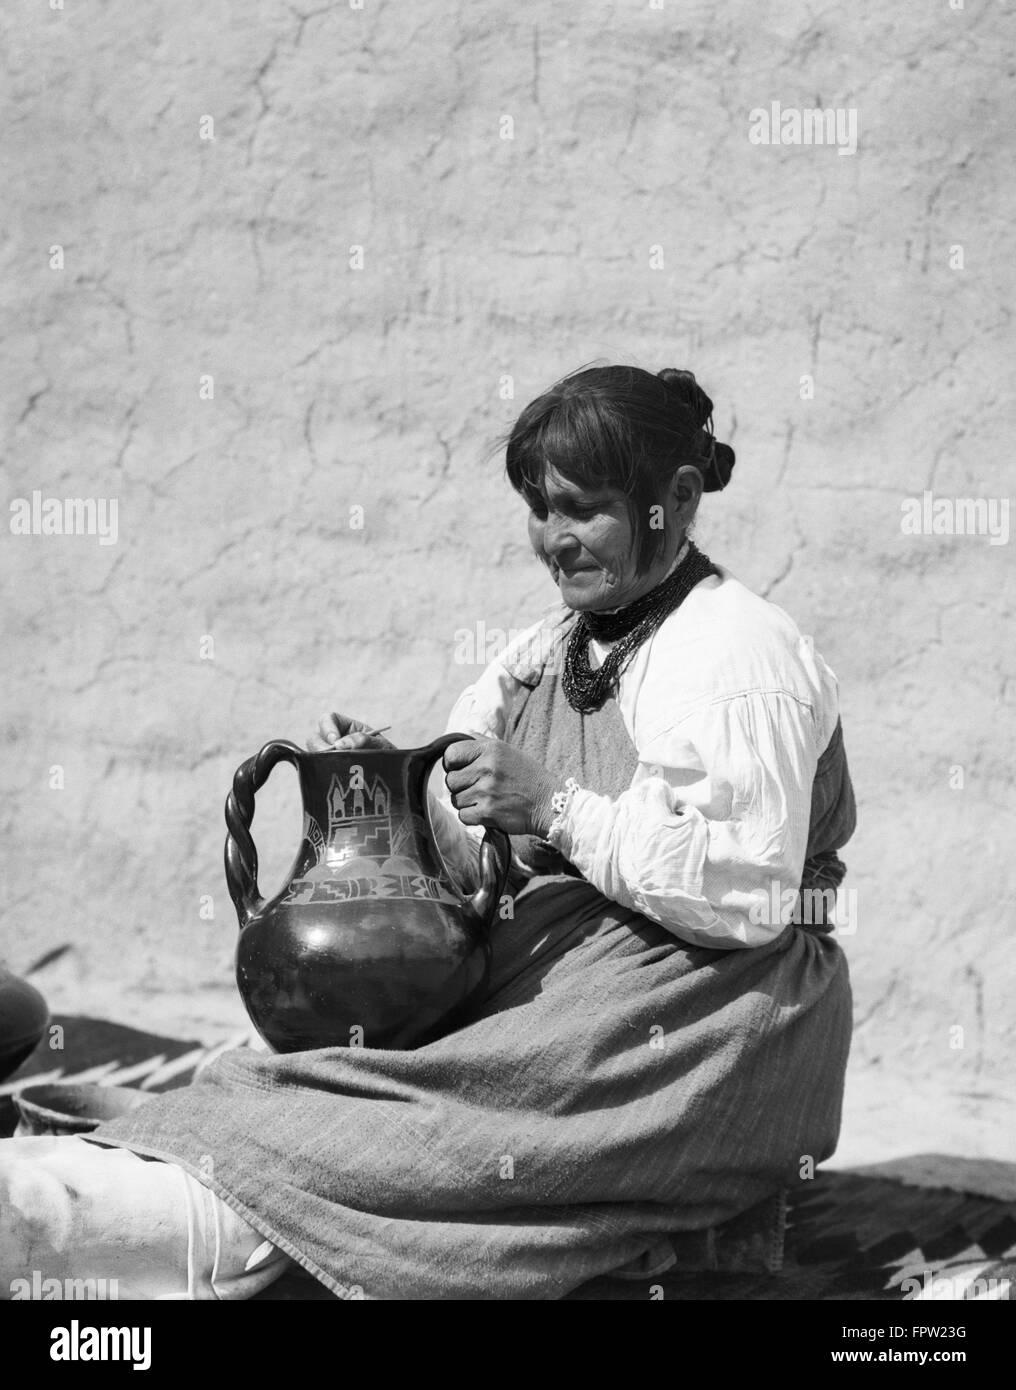 1930s NATIVE AMERICAN INDIAN WOMAN POLISHING PIECE OF POTTERY SANTA CLARA PUEBLO NEW MEXICO USA - Stock Image